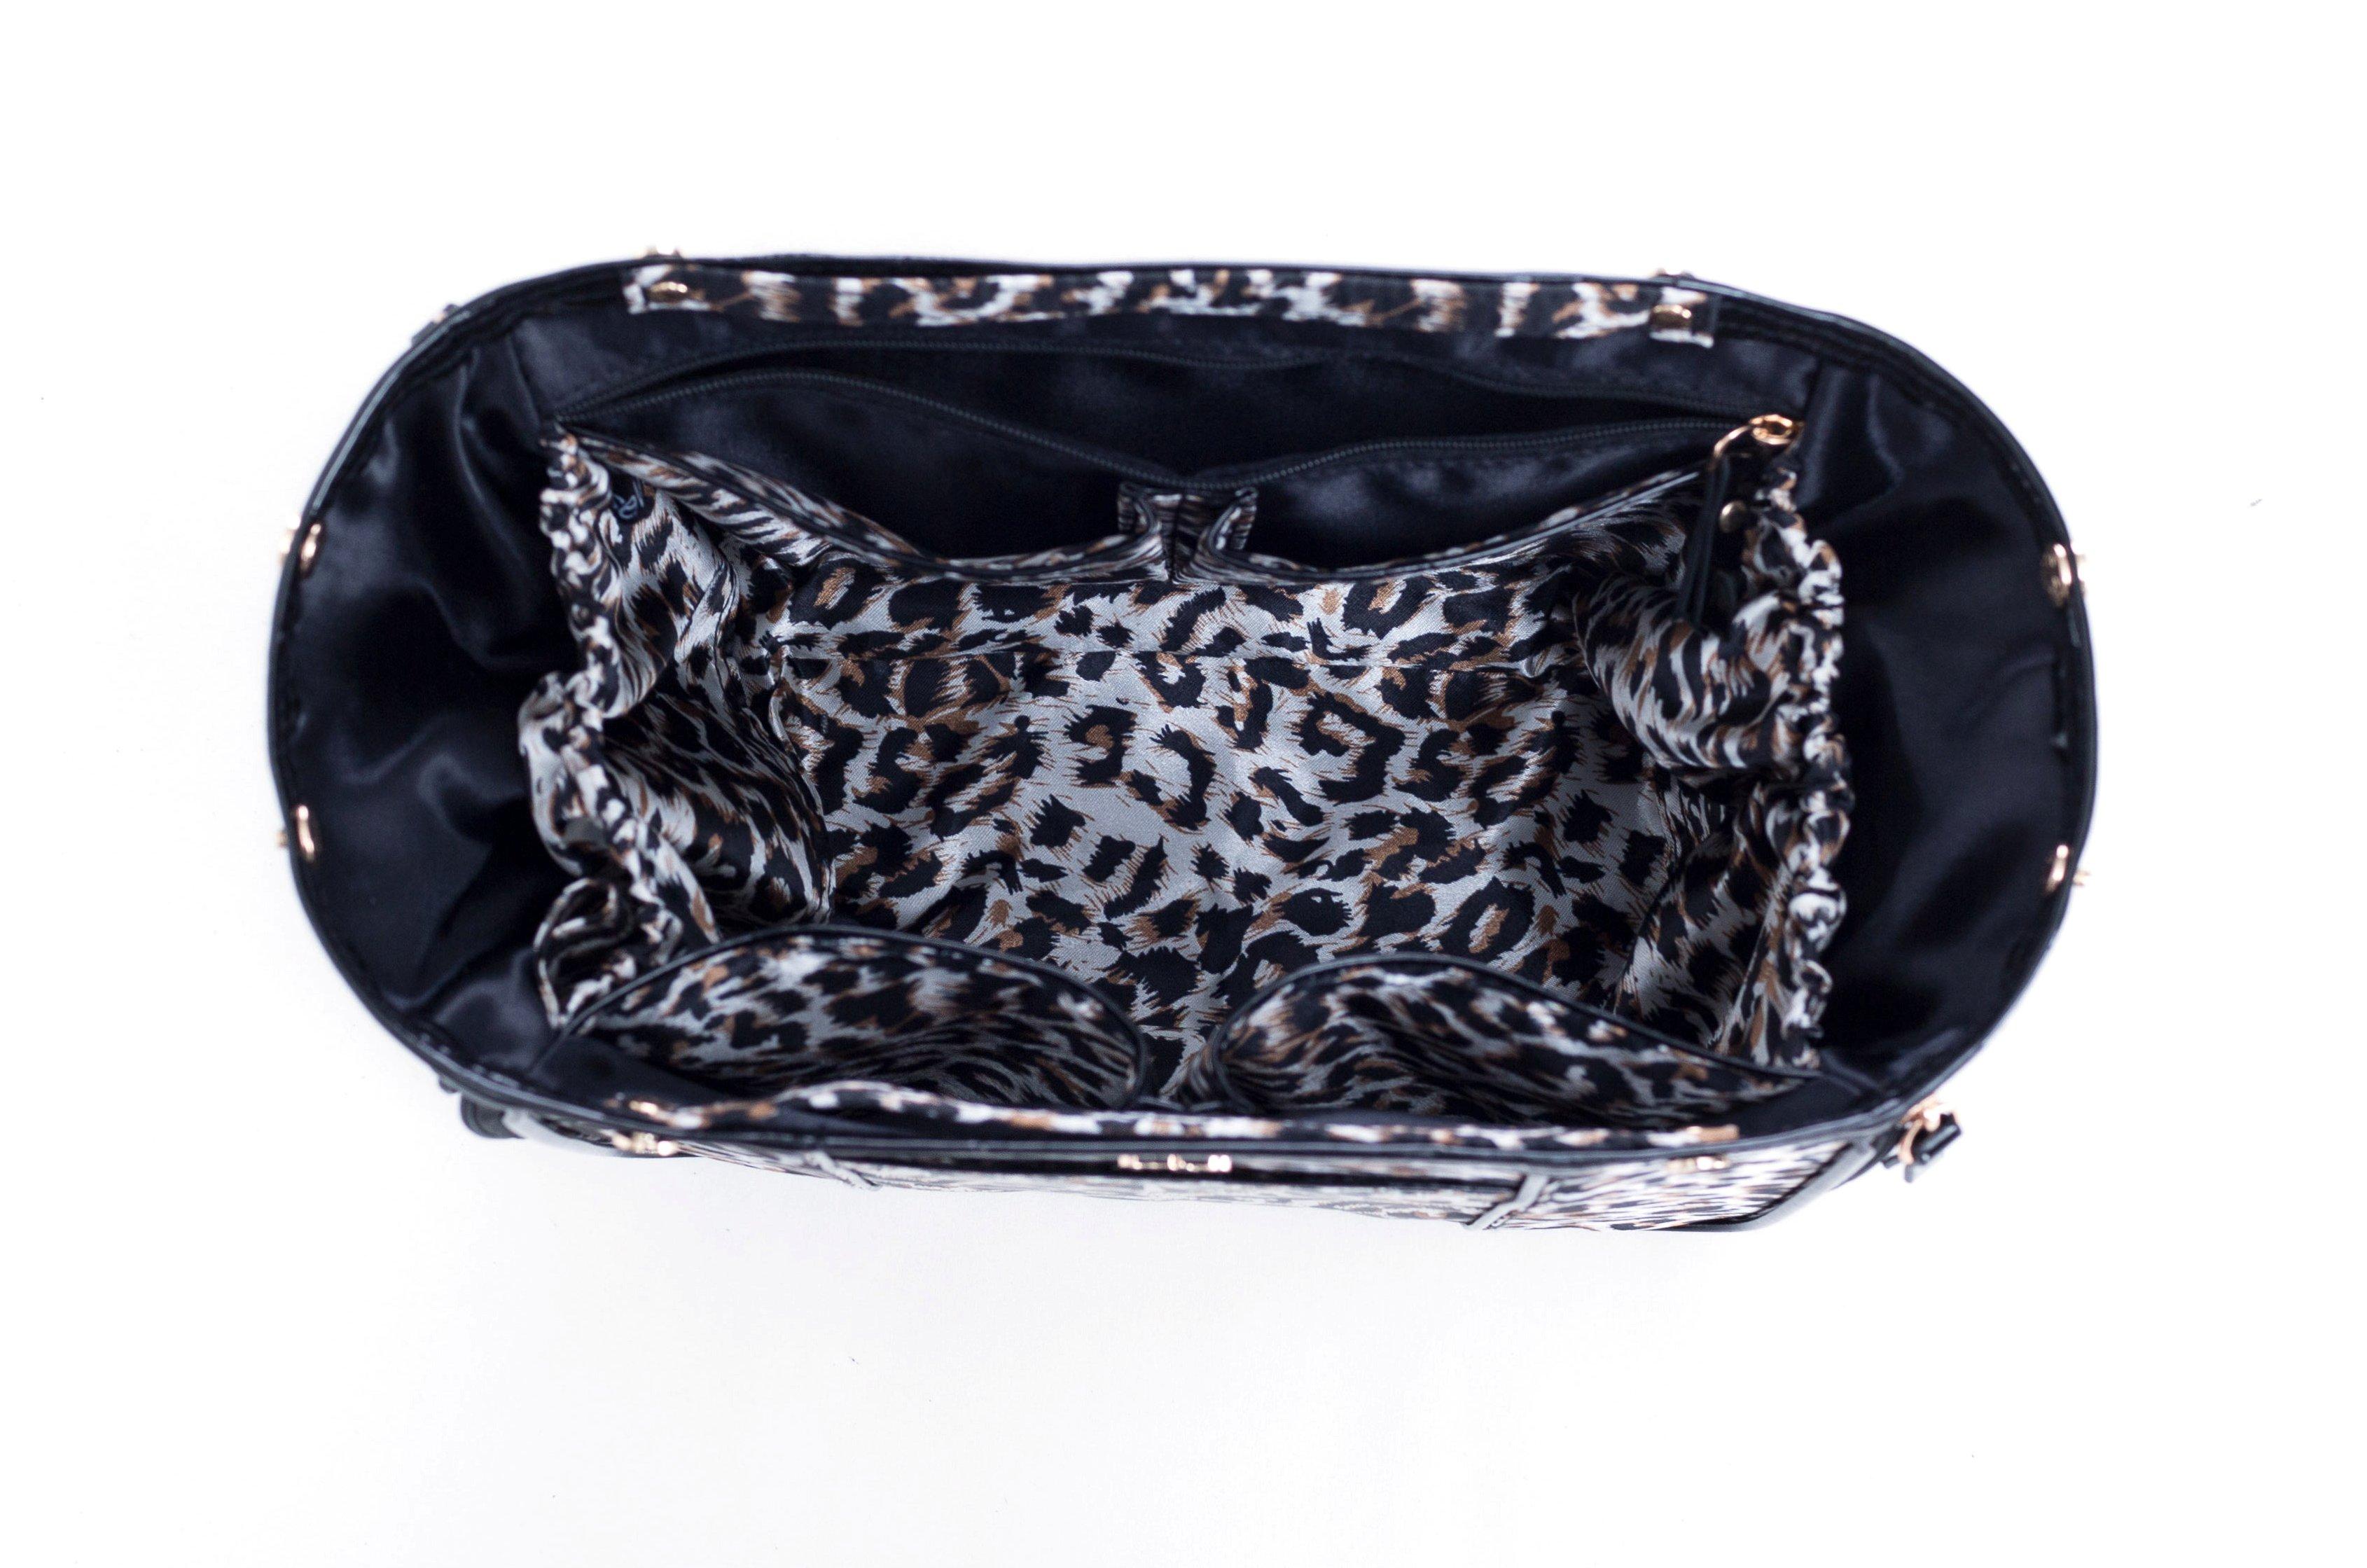 01e99bacc421 PurseN Expandable Purse Organizer Bag Insert High Quality